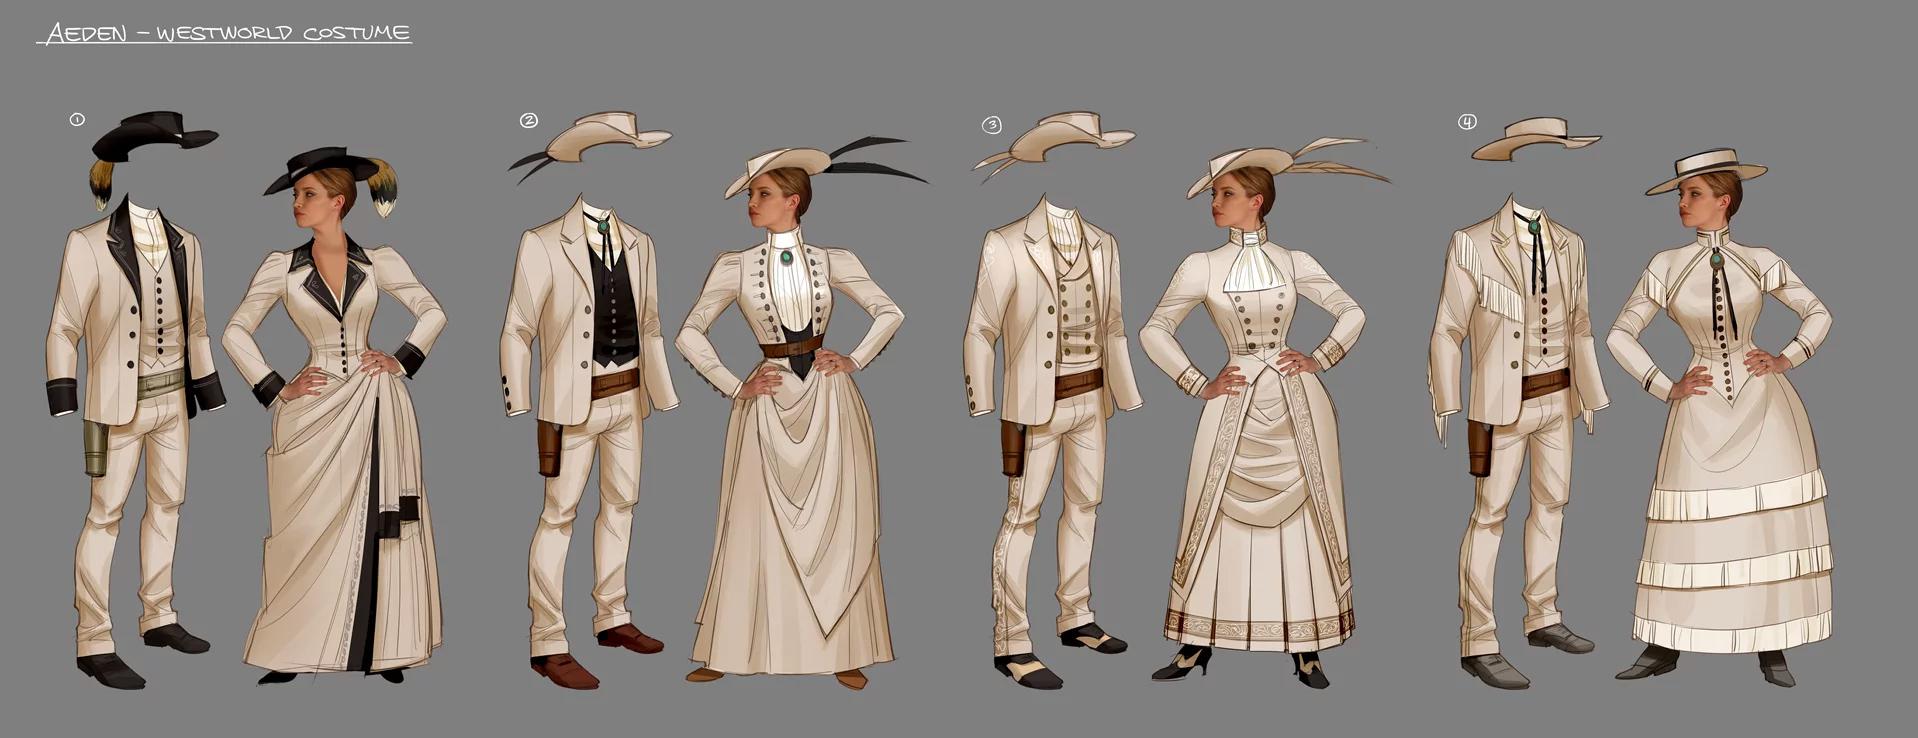 second round of costume design for Imogen & Aeden